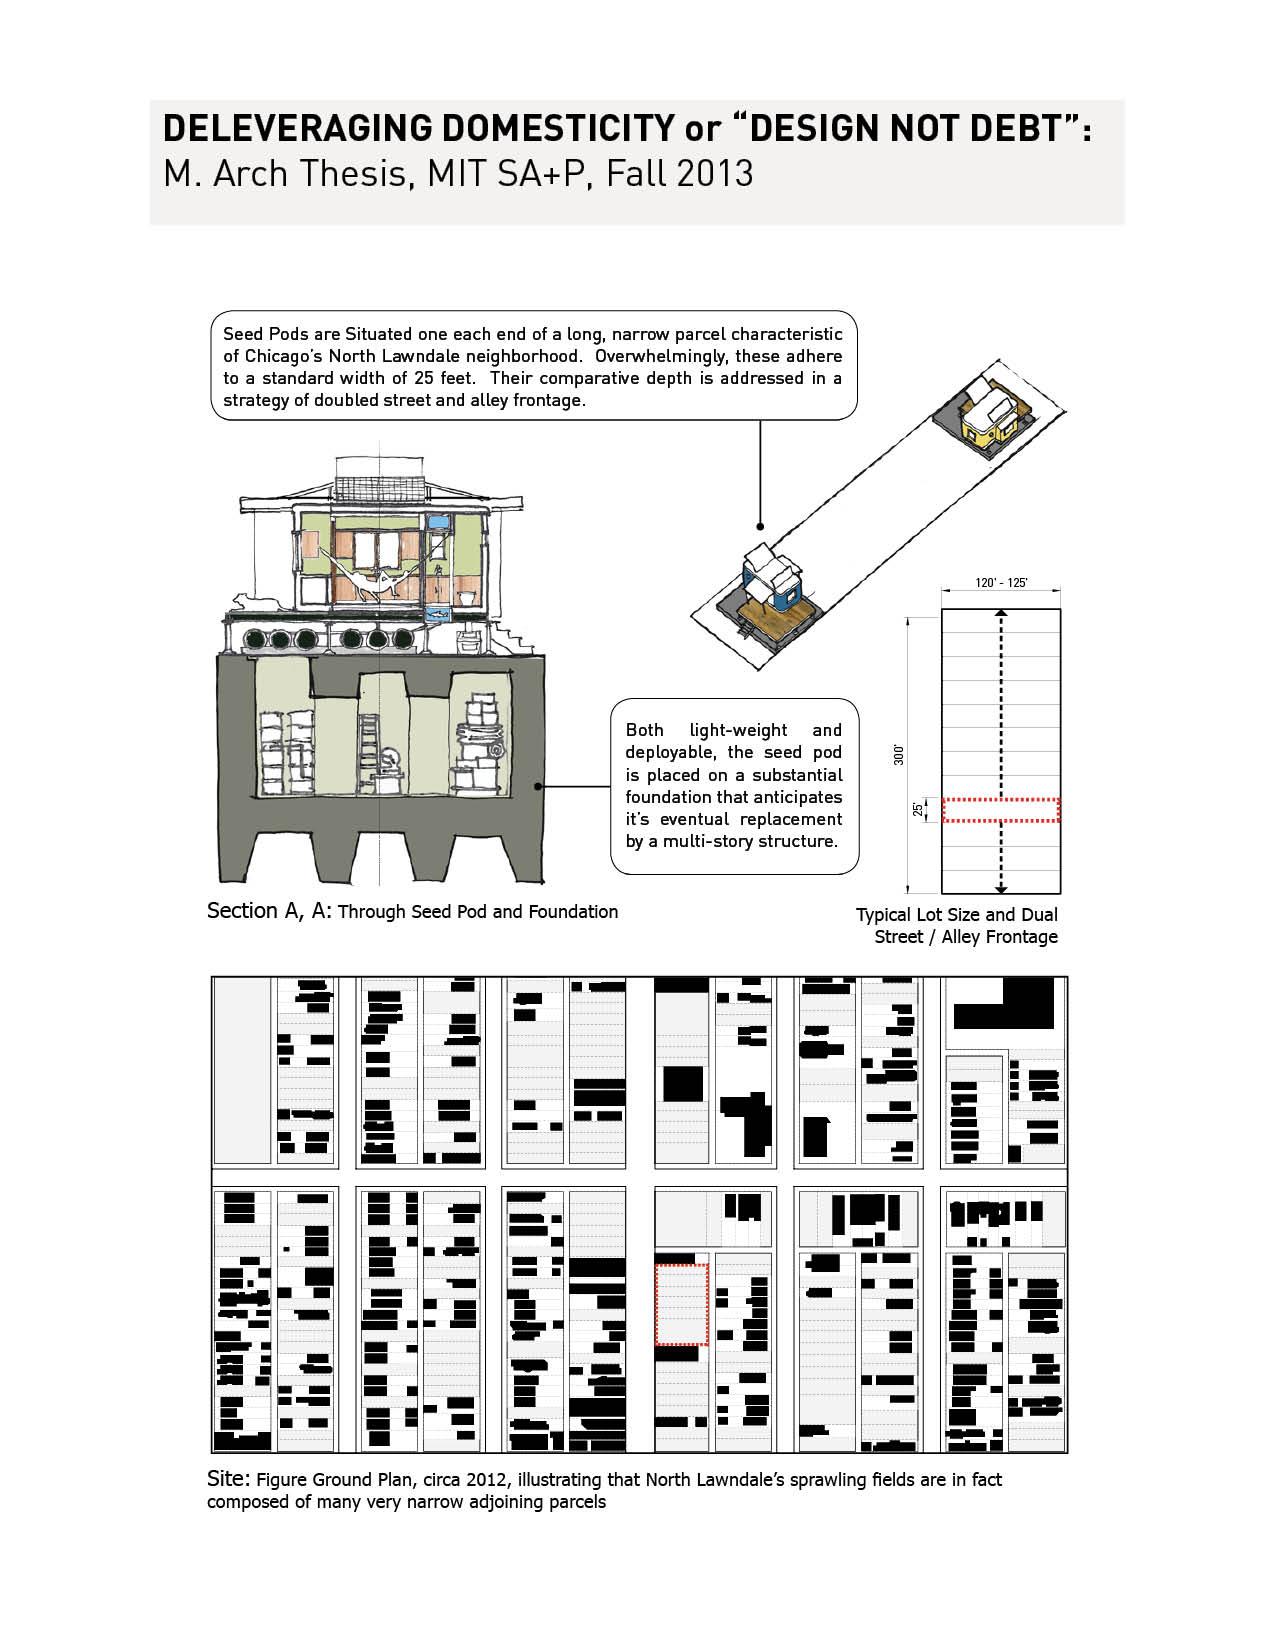 MIT_thesis4.jpg